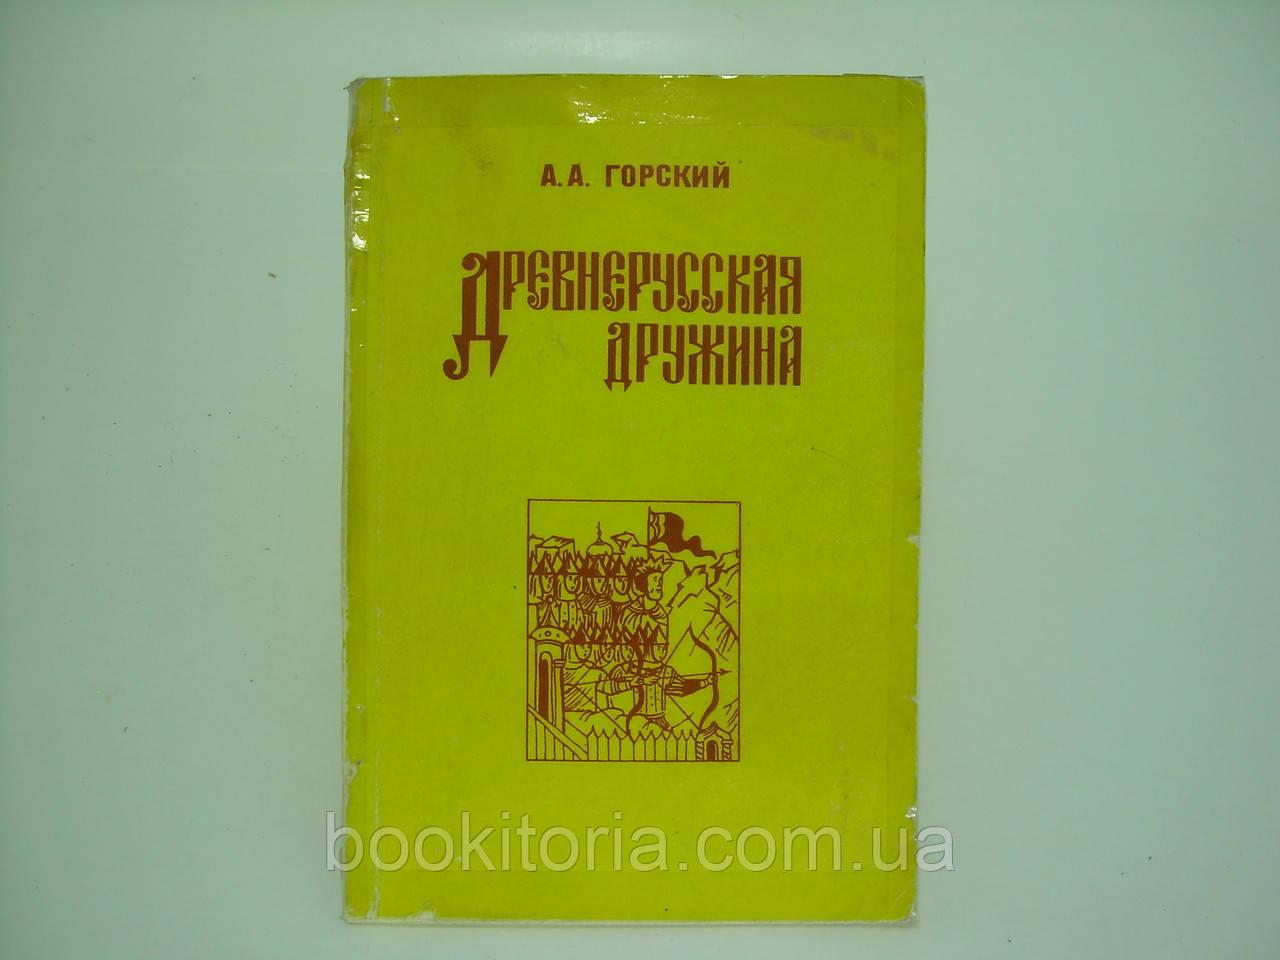 Горский А.А. Древнерусская дружина (б/у).